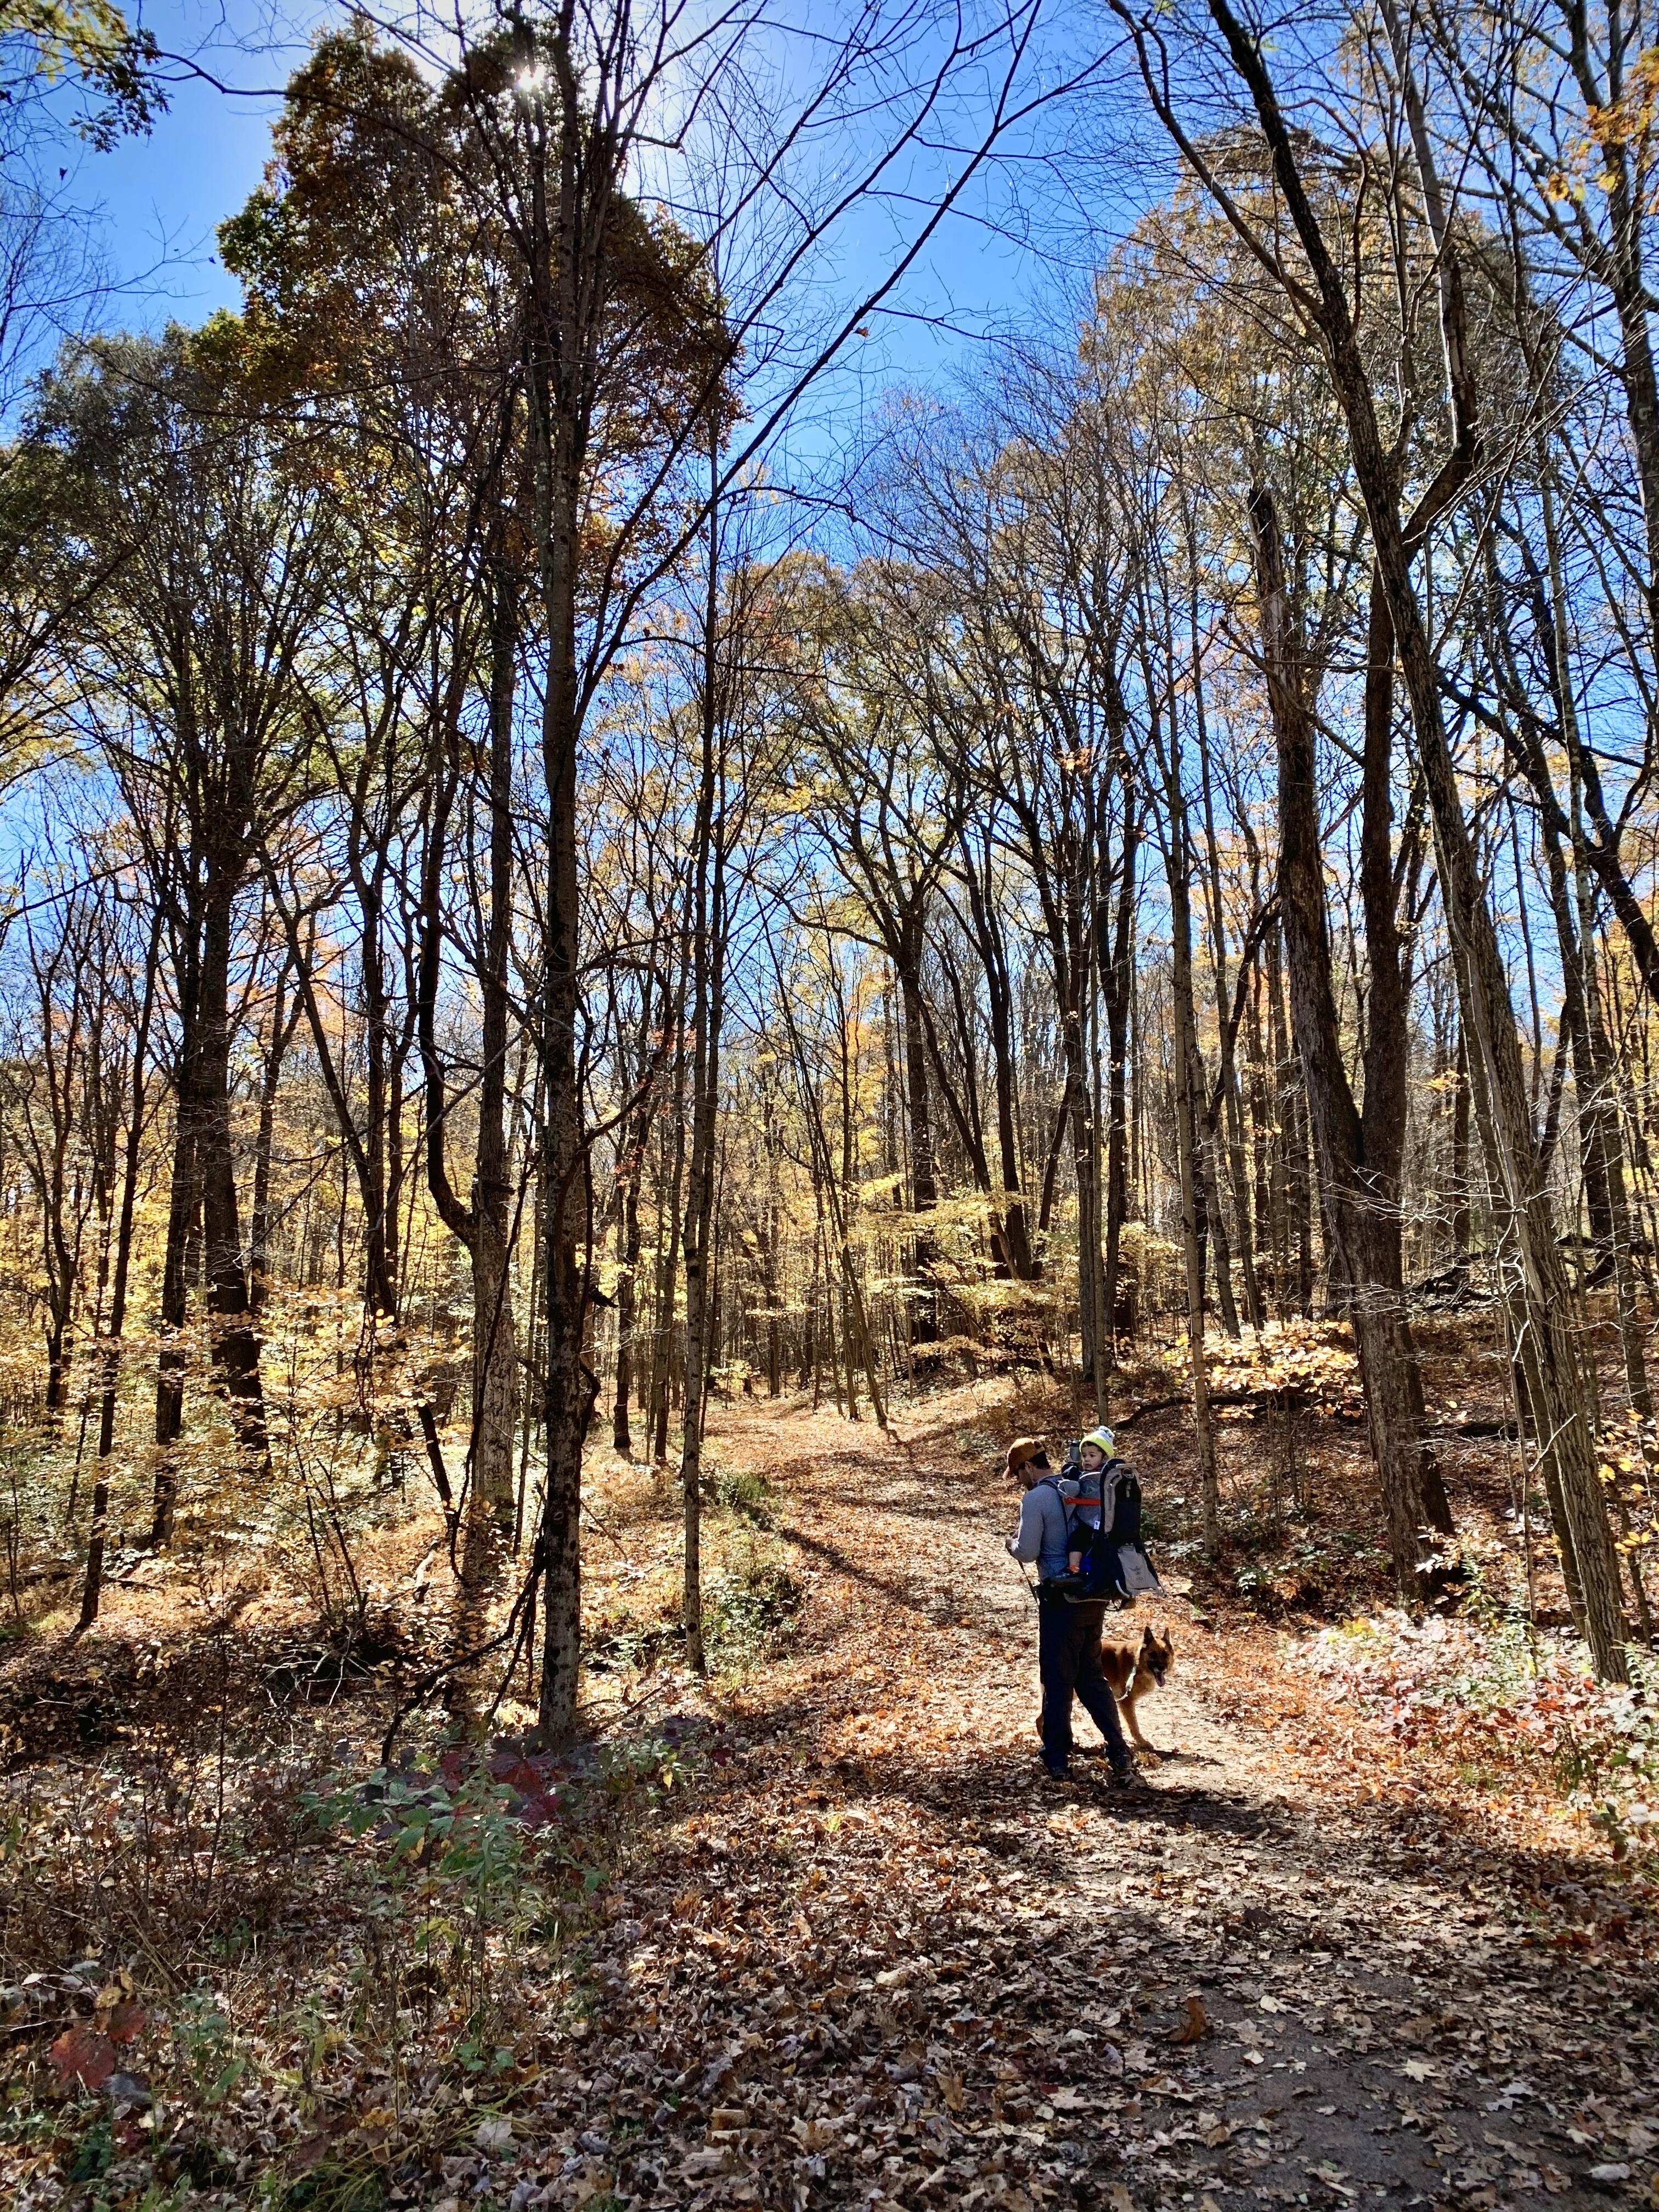 LAUREL HILL, Pa - Hikers enjoy the trail at Laurel Hill State Park.jpeg.jpeg